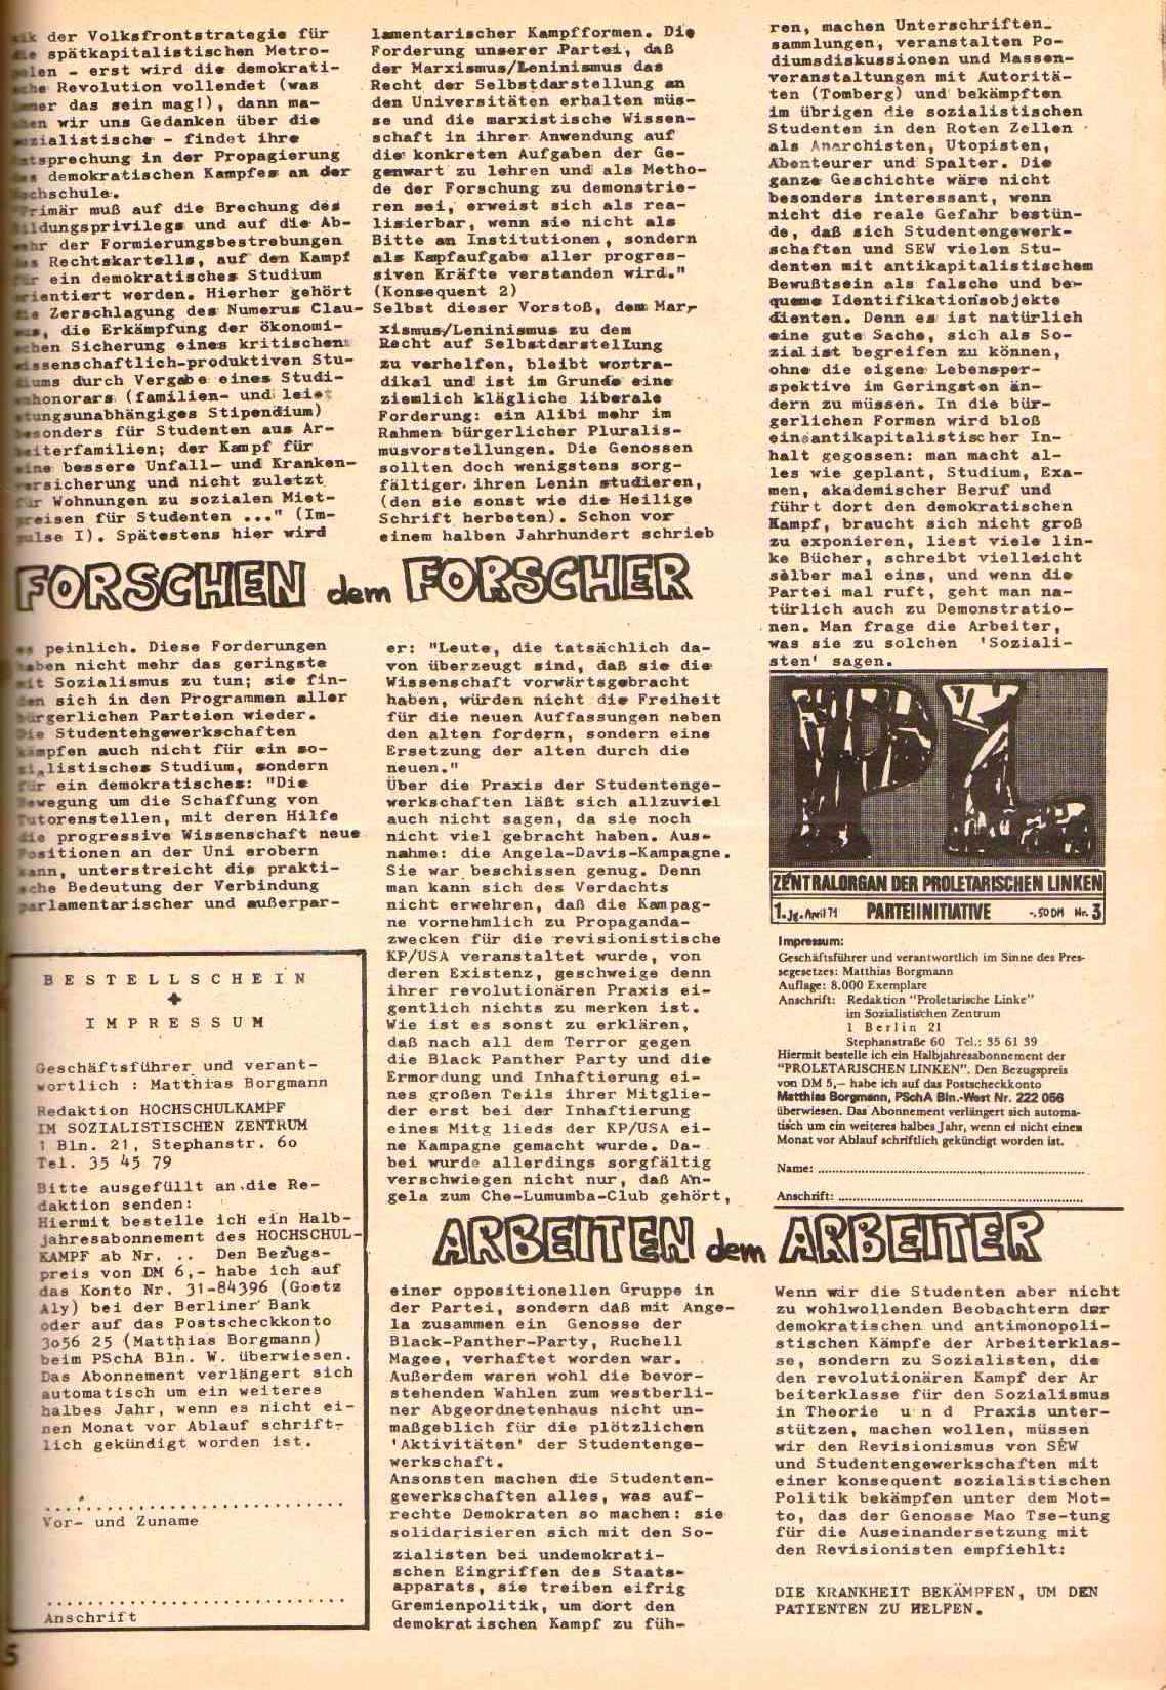 Berlin_Hochschulkampf_1971_06_05